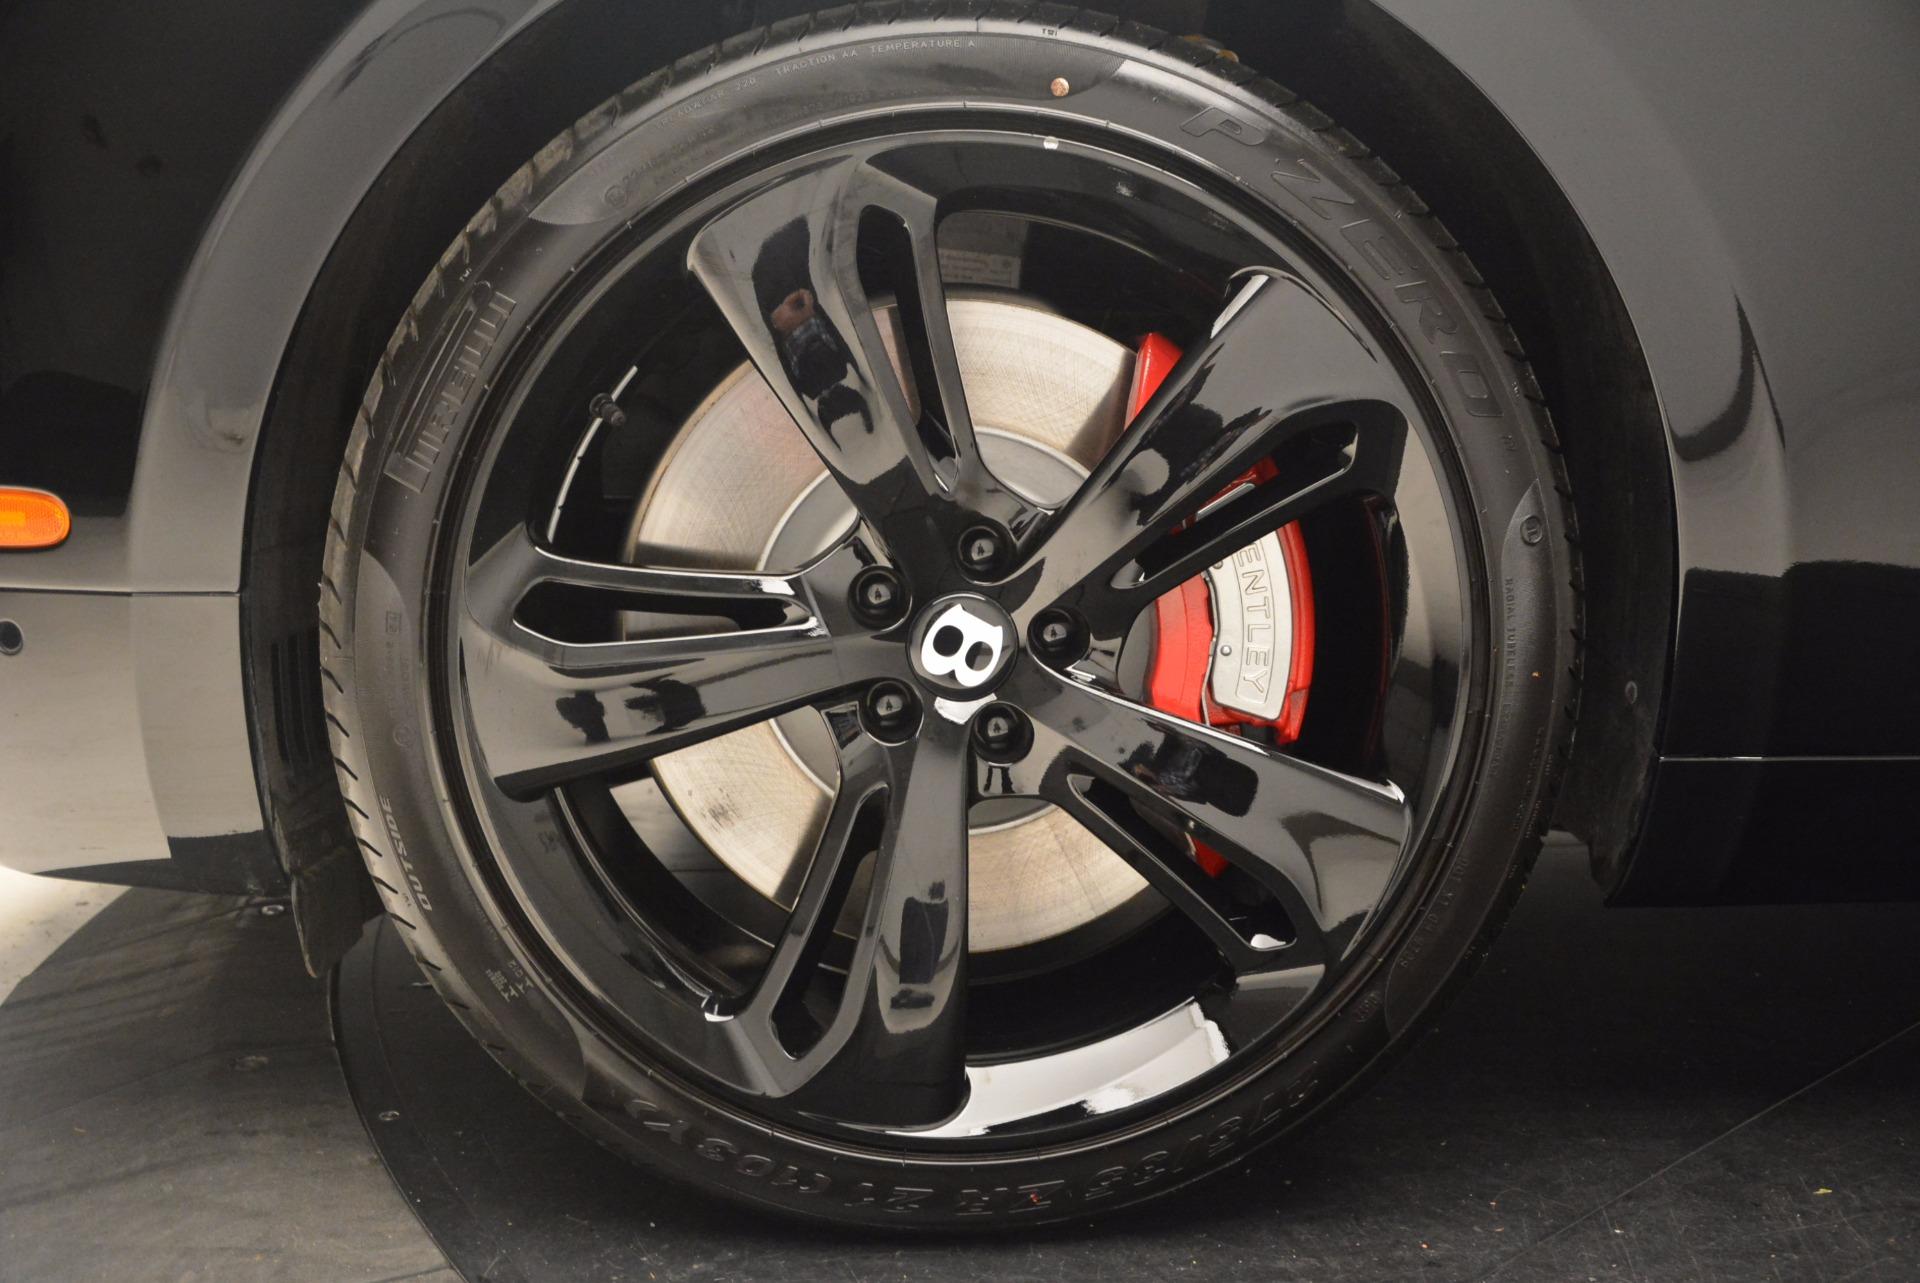 New-2017-Bentley-Flying-Spur-W12-S